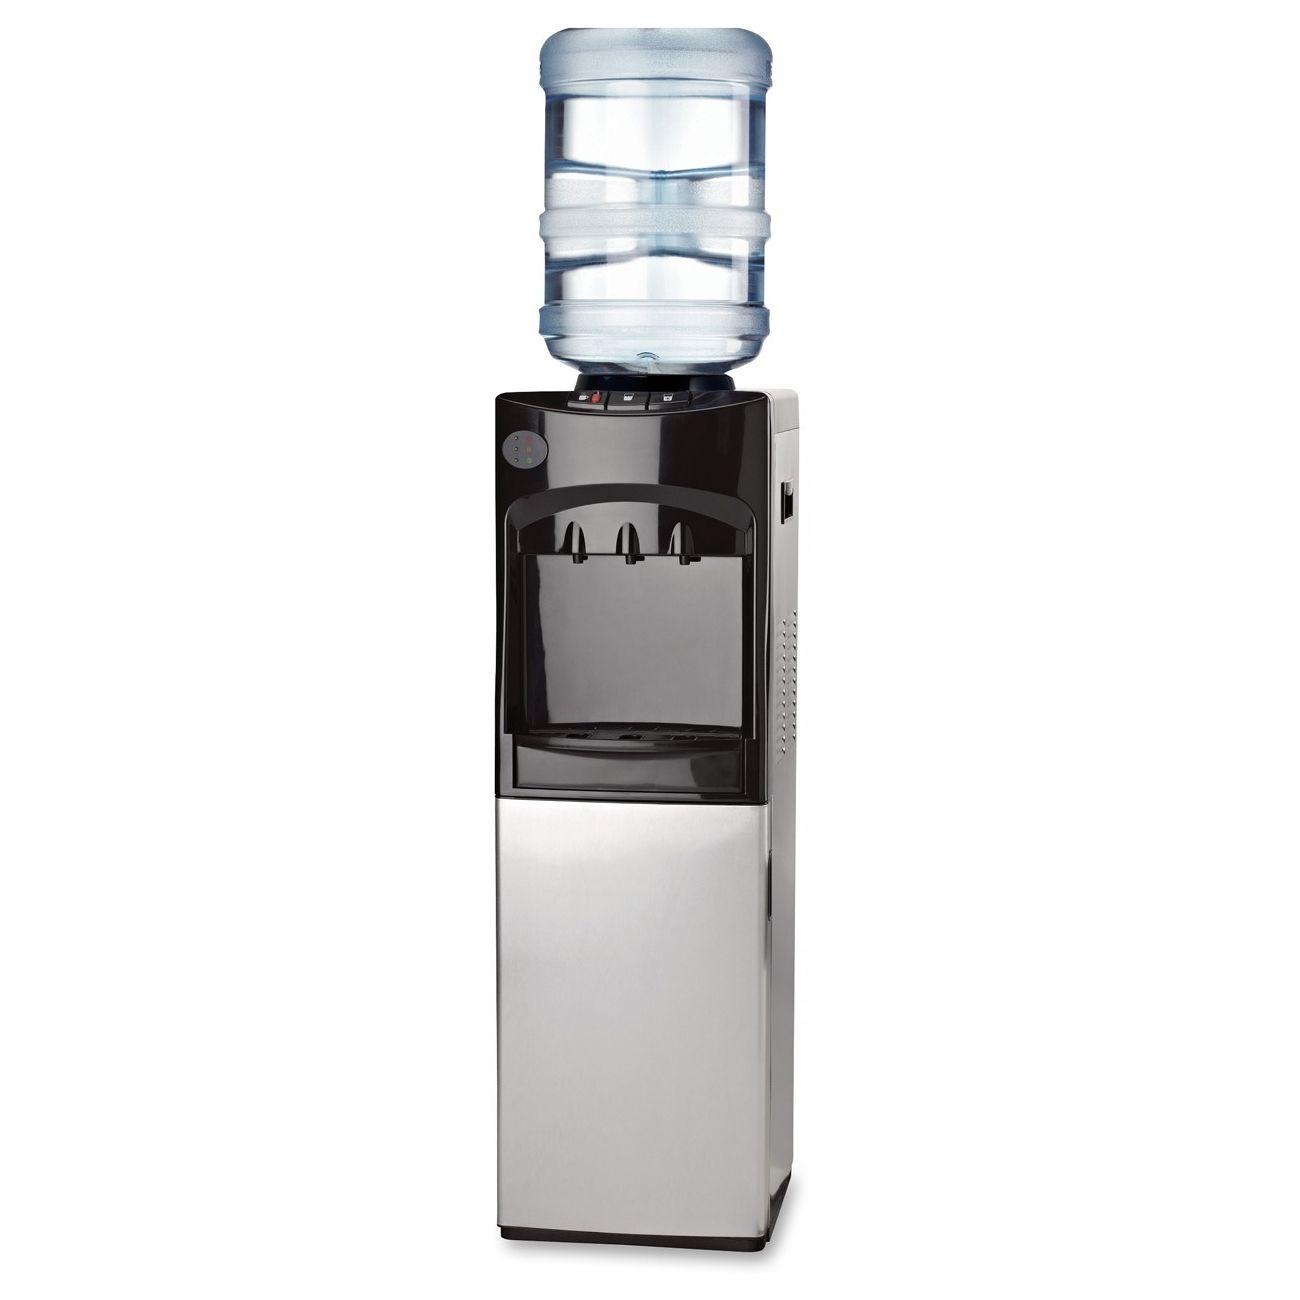 Freestanding Water Cooler Item Gjo22552 Dispenses Cold Water